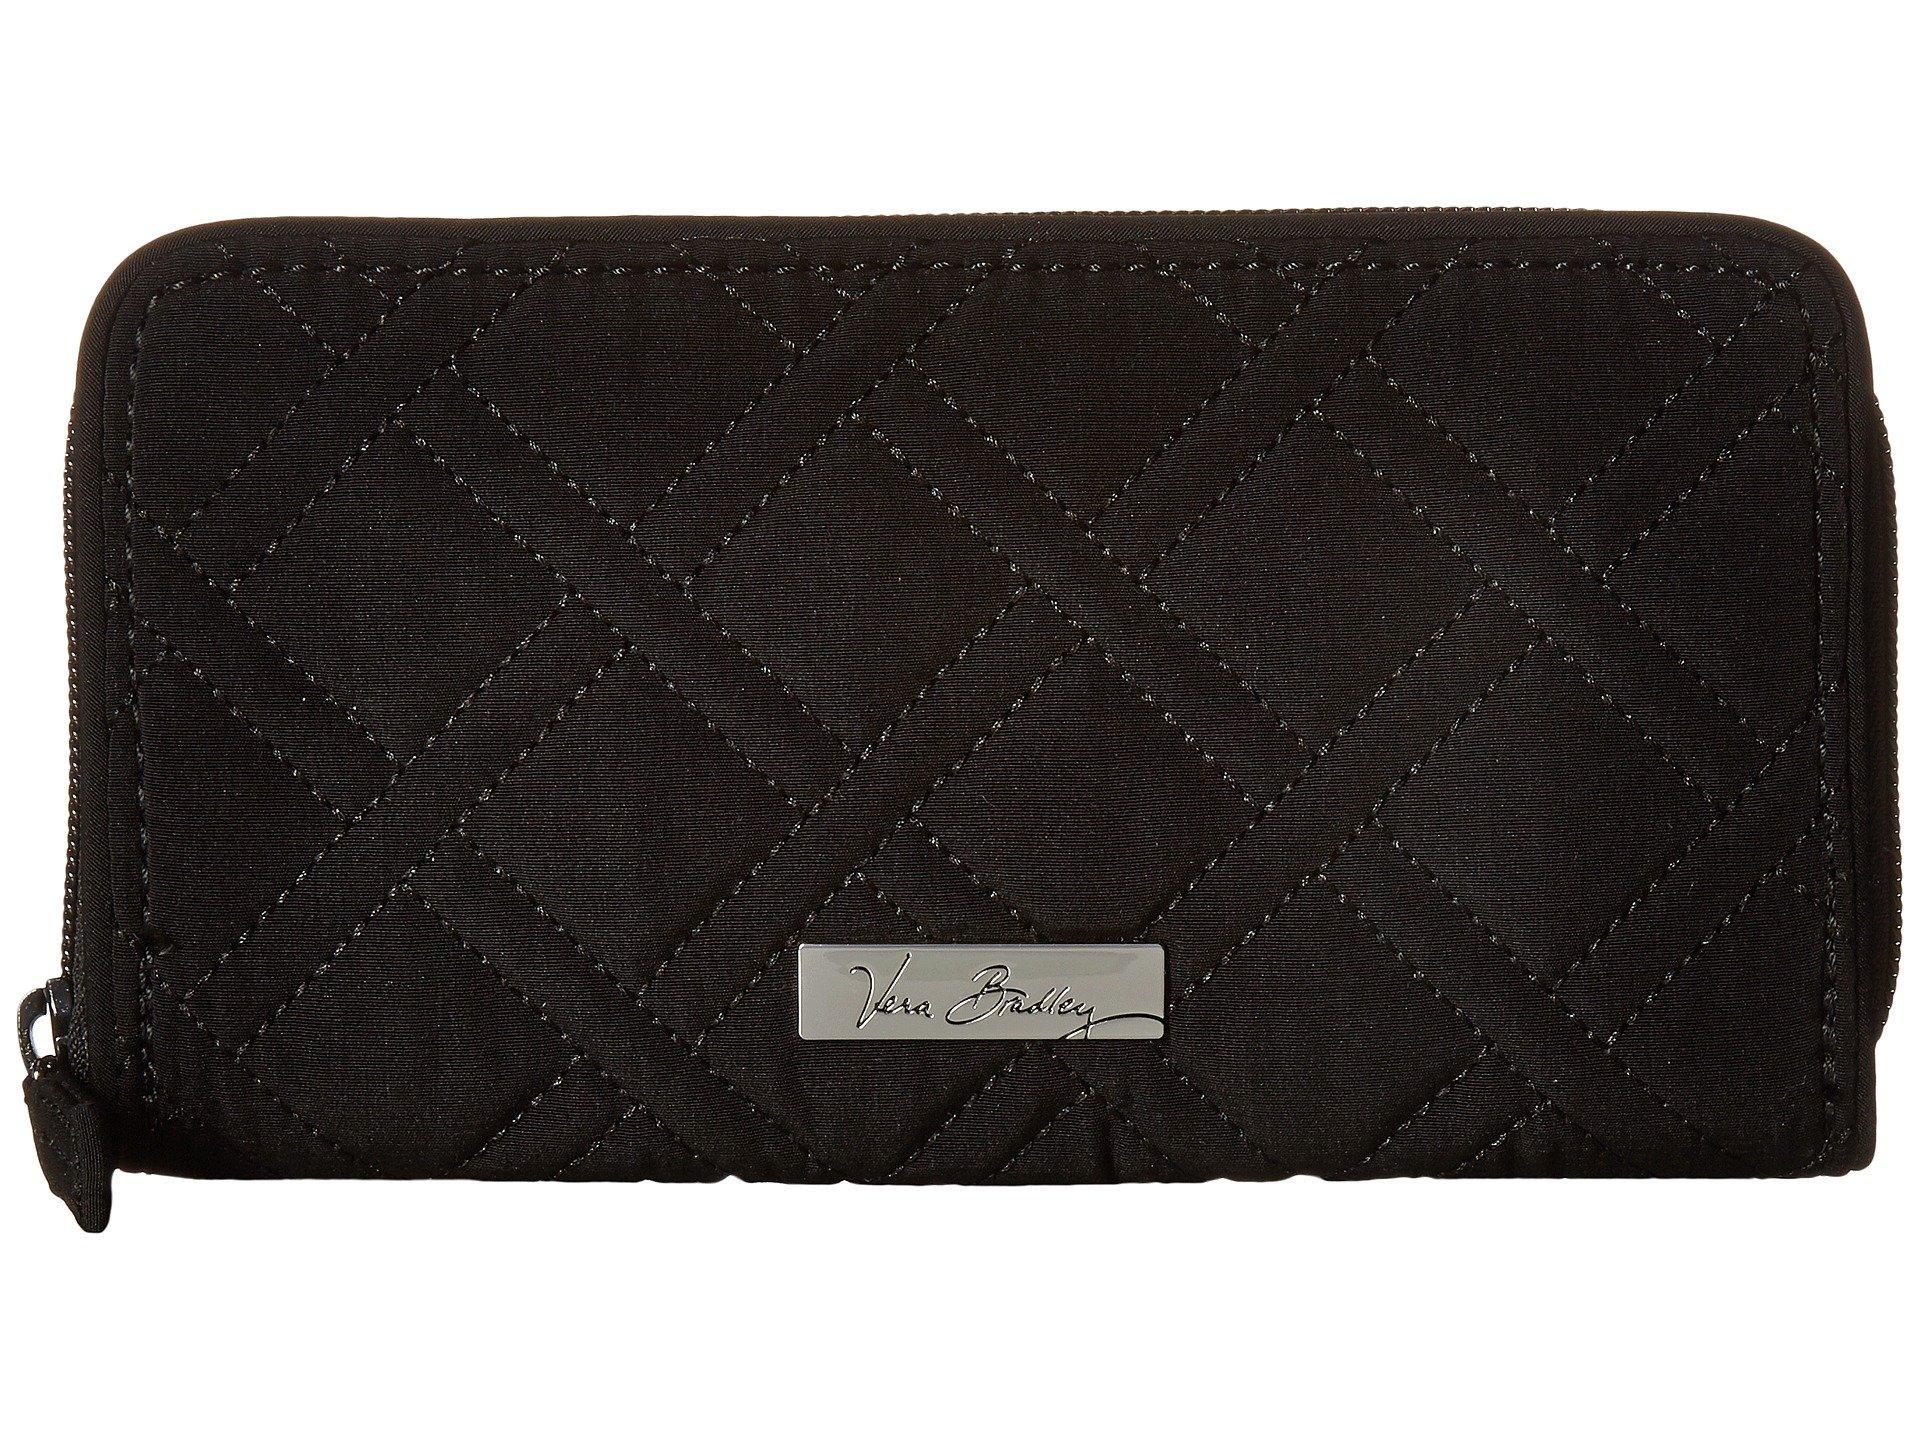 Bradley Wallet Black Rfid Classic Vera Georgia xBg8wfdZn